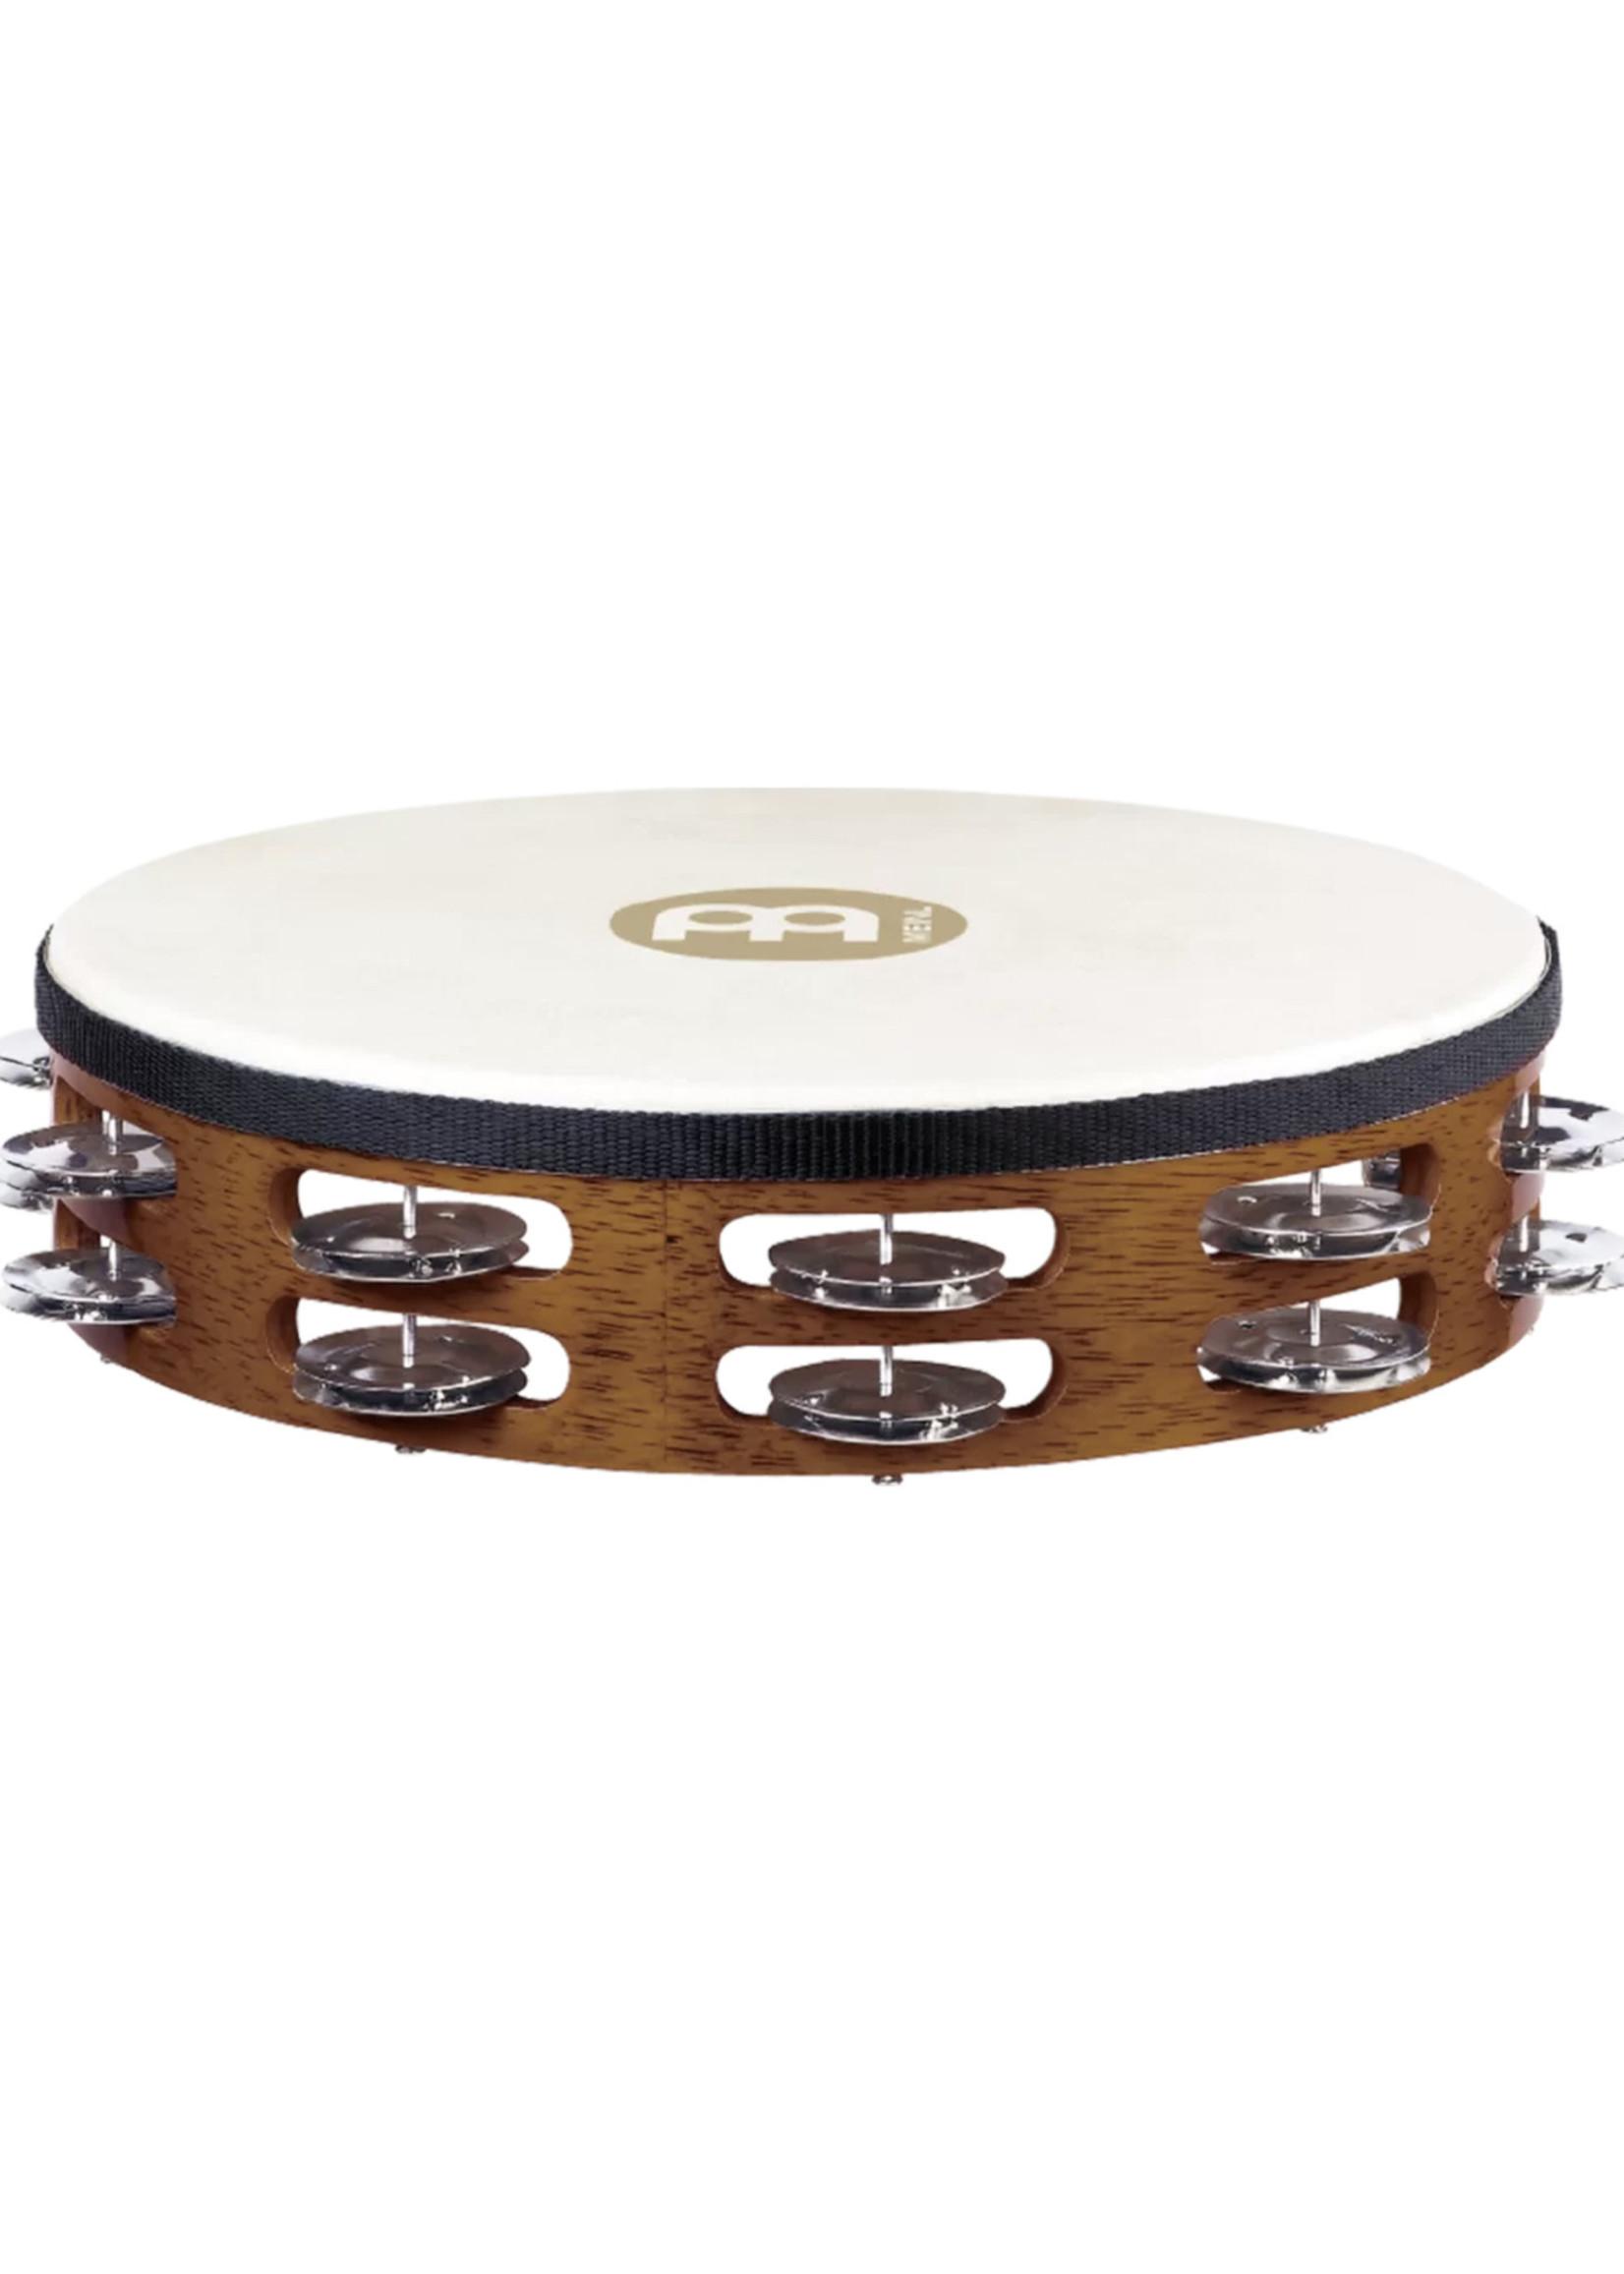 Meinl Goatskin Coated Tambourine